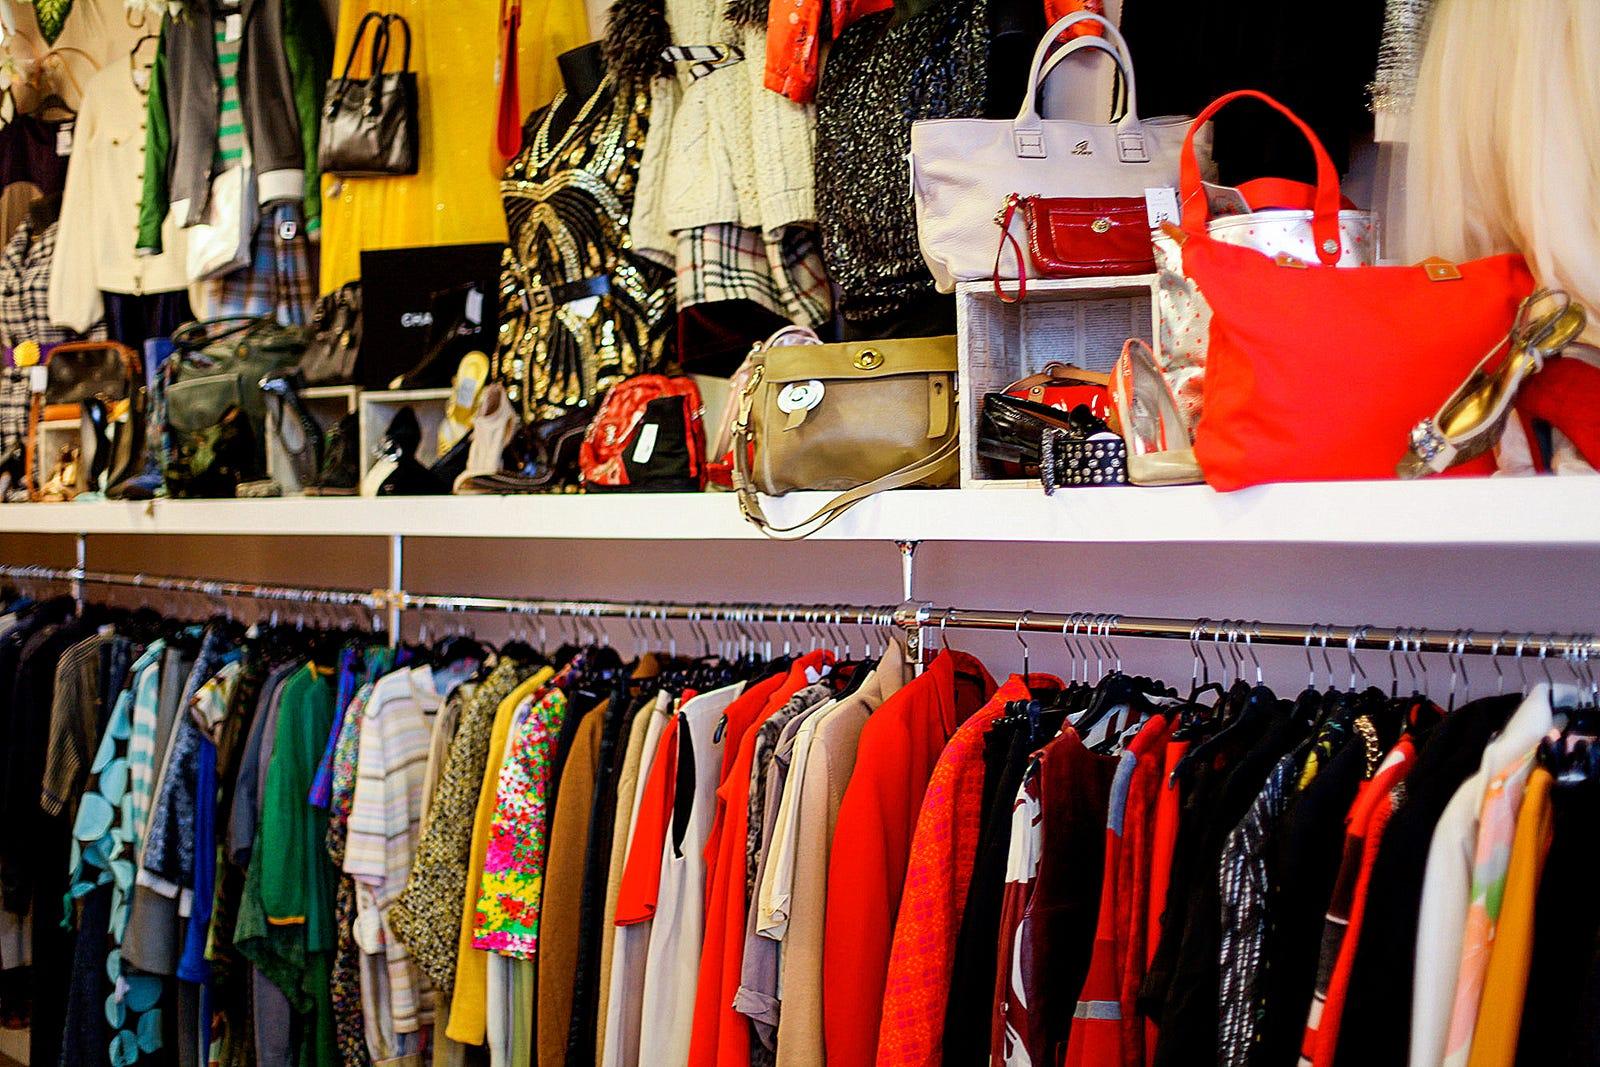 47a2a447203 London Designer Consignment Stories - handbags